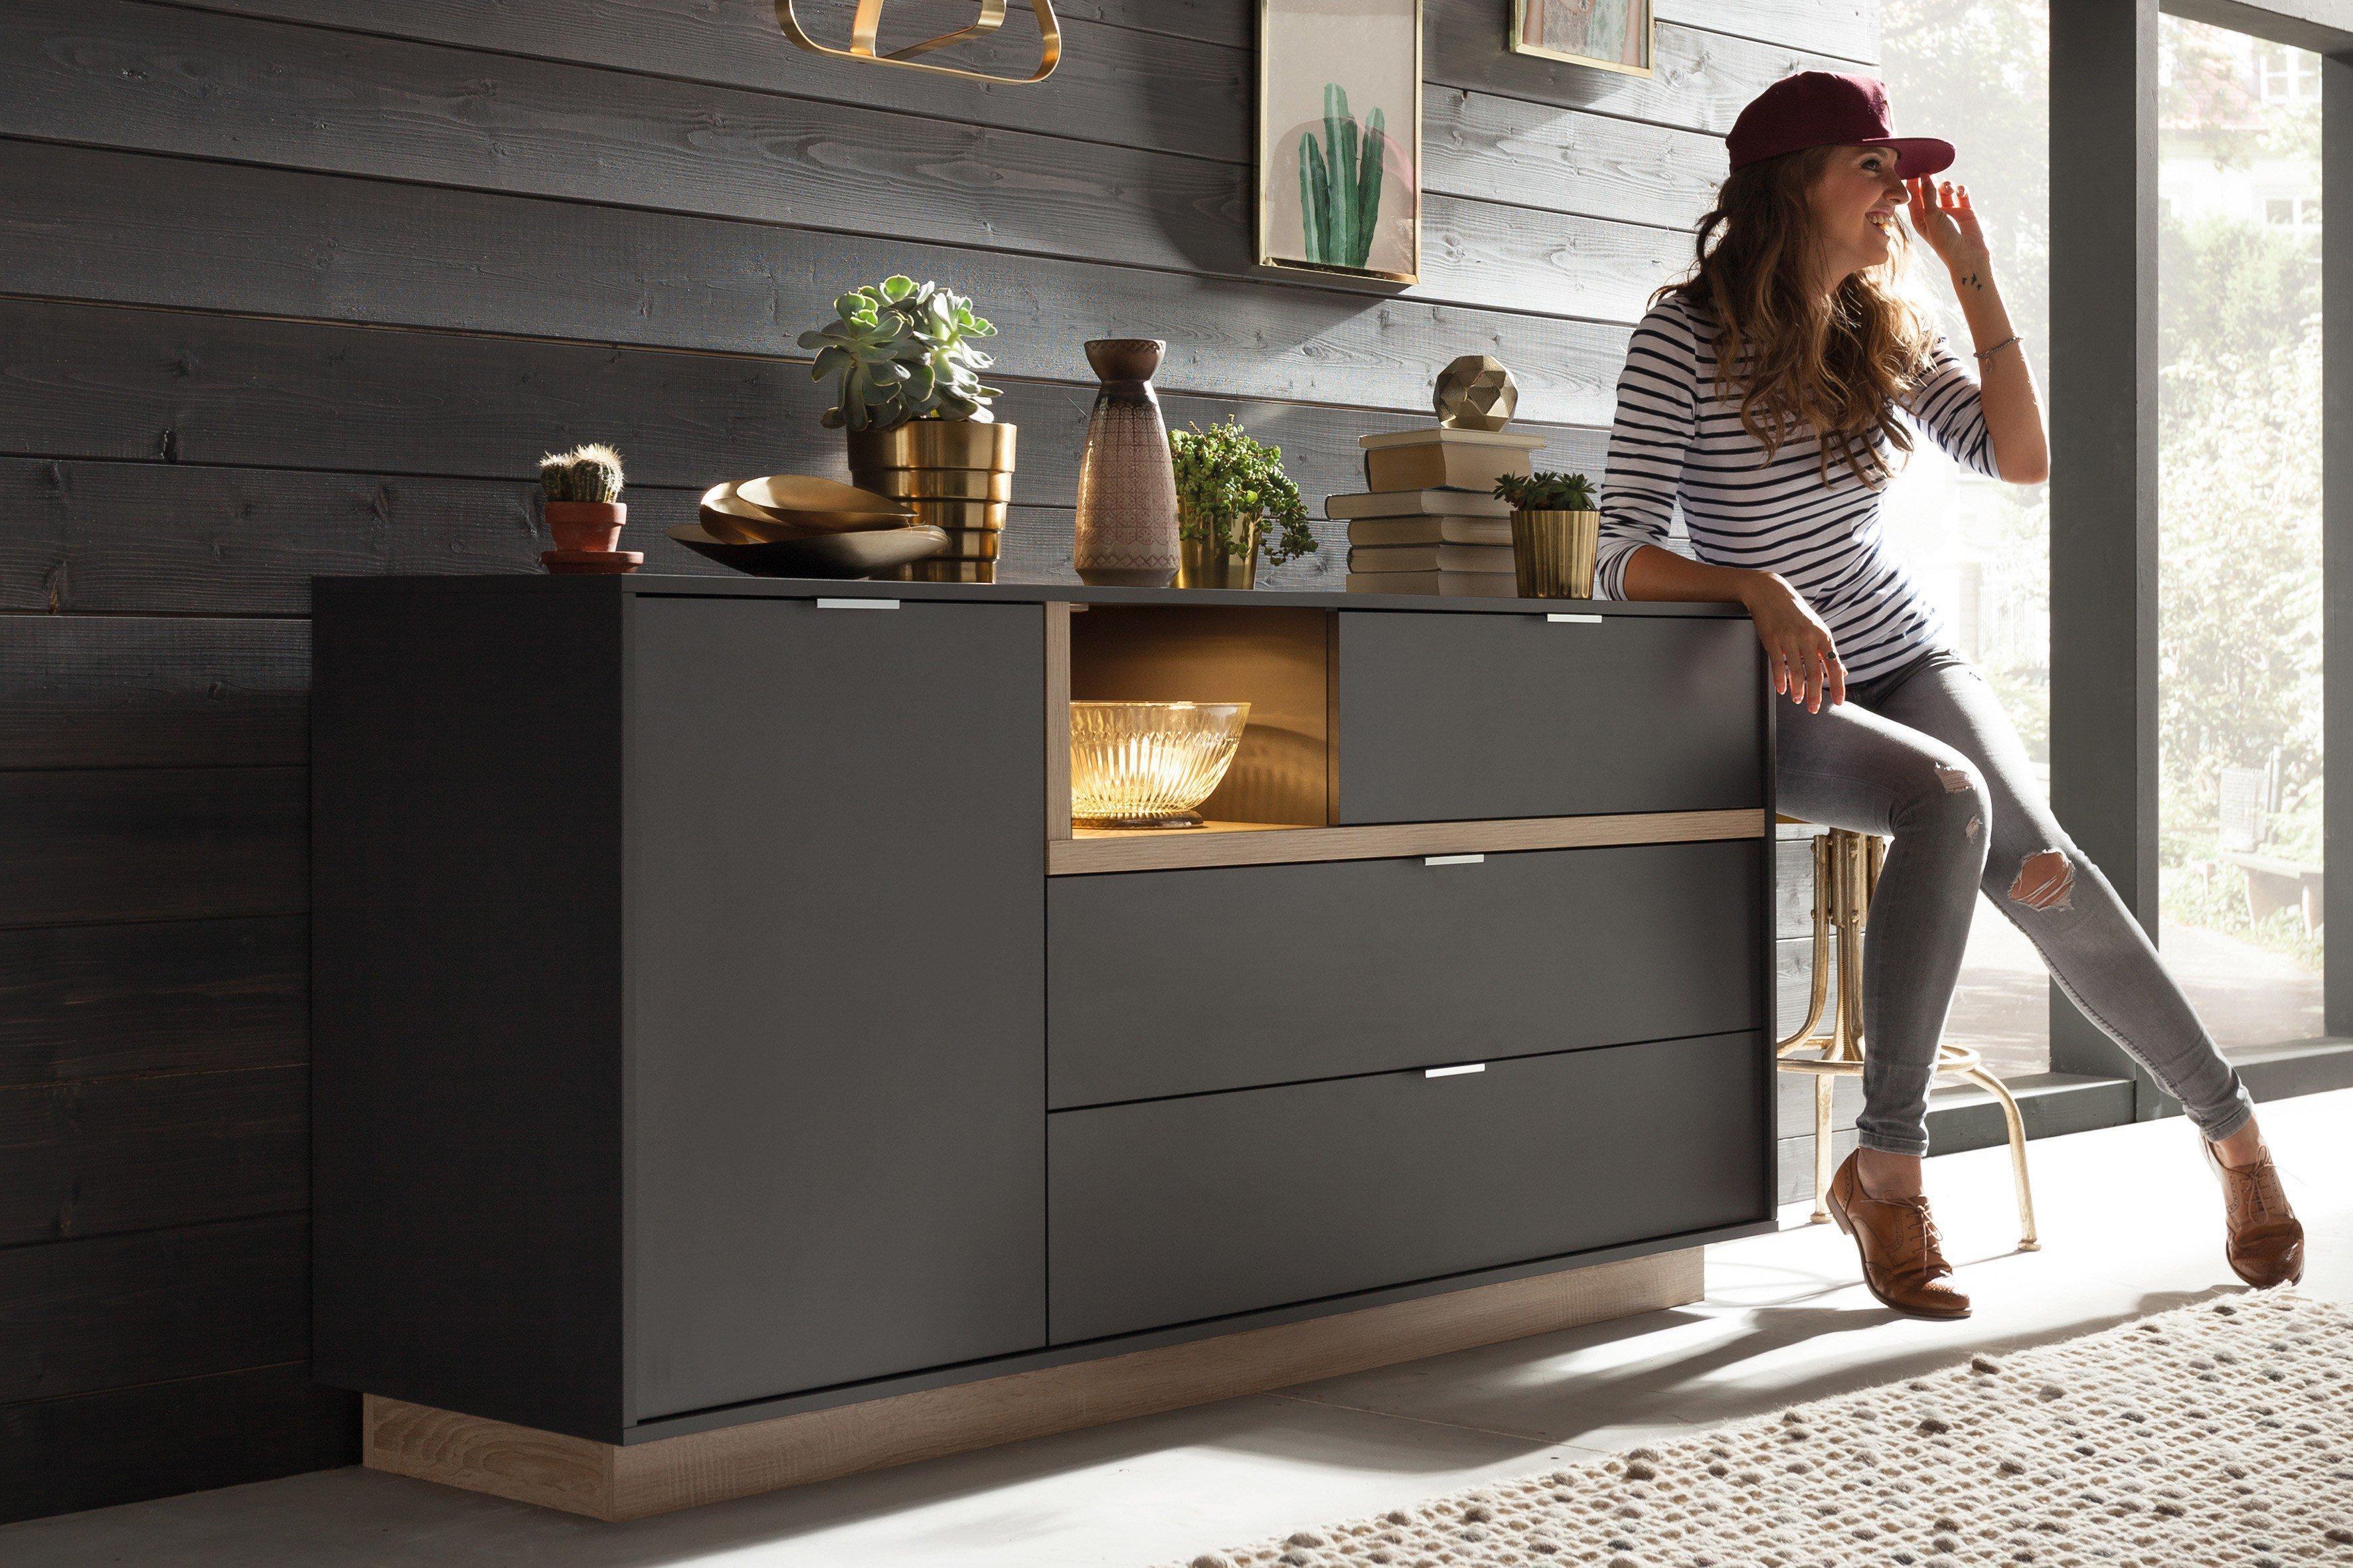 cs schmalm bel sideboard my ell graphit eiche m bel. Black Bedroom Furniture Sets. Home Design Ideas